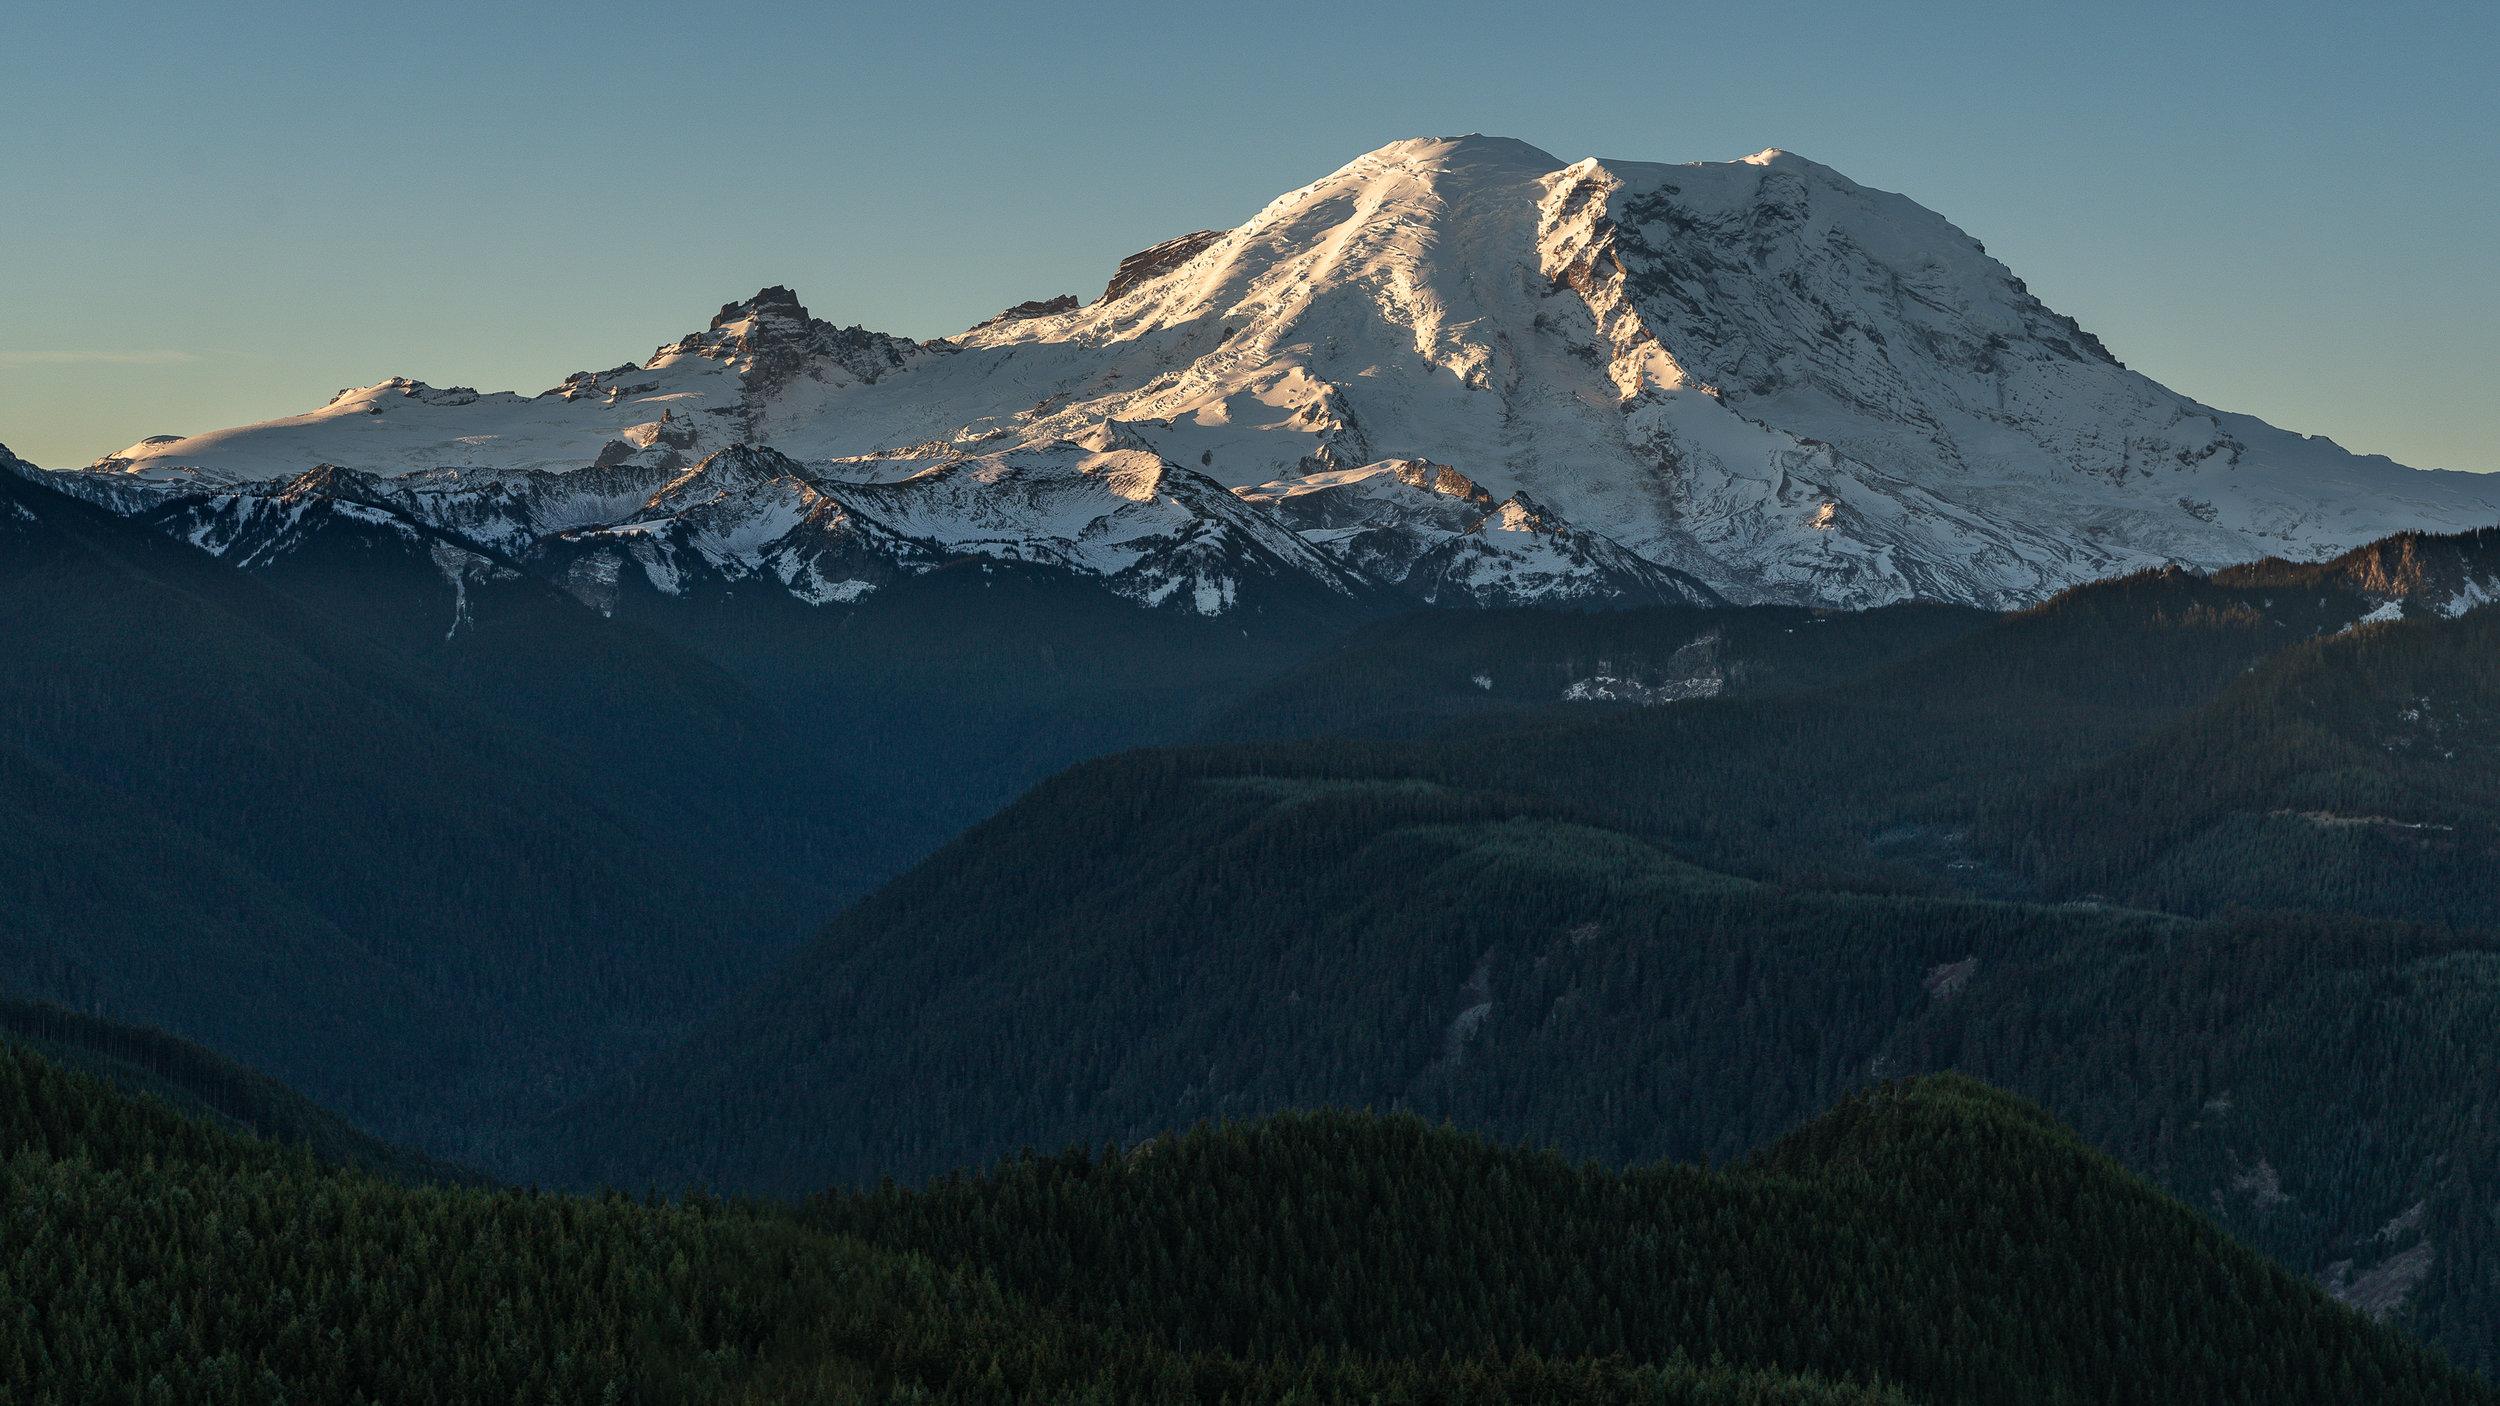 2018-11-17 Mt Rainier & ThanksGiving_20181118_DJIMavicOG_T_A01463-Edit.jpg